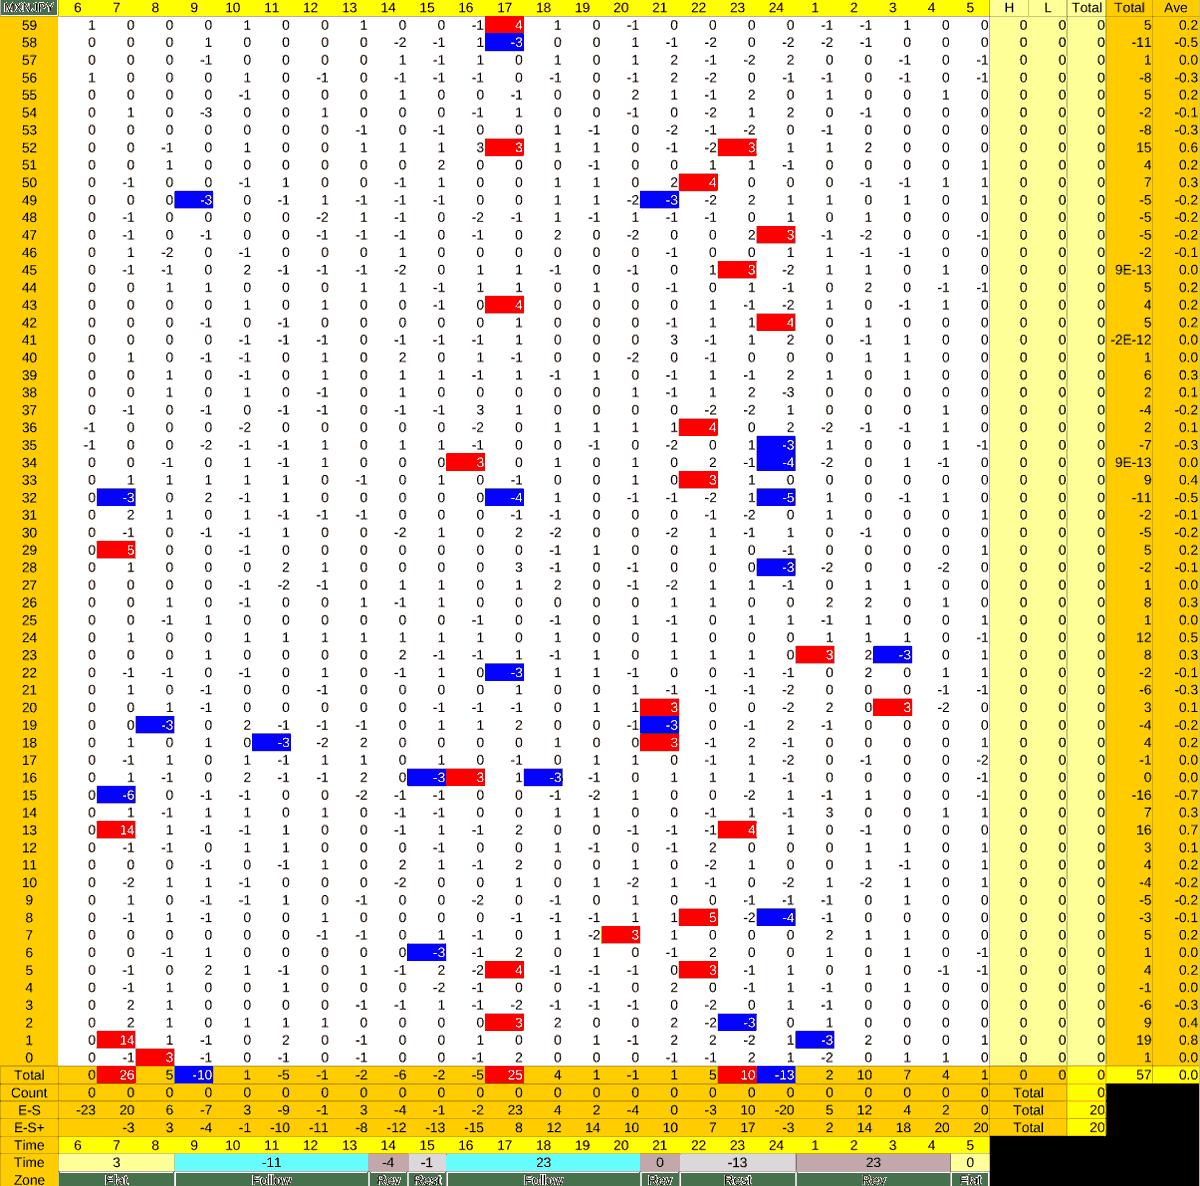 20210315_HS(3)MXNJPY